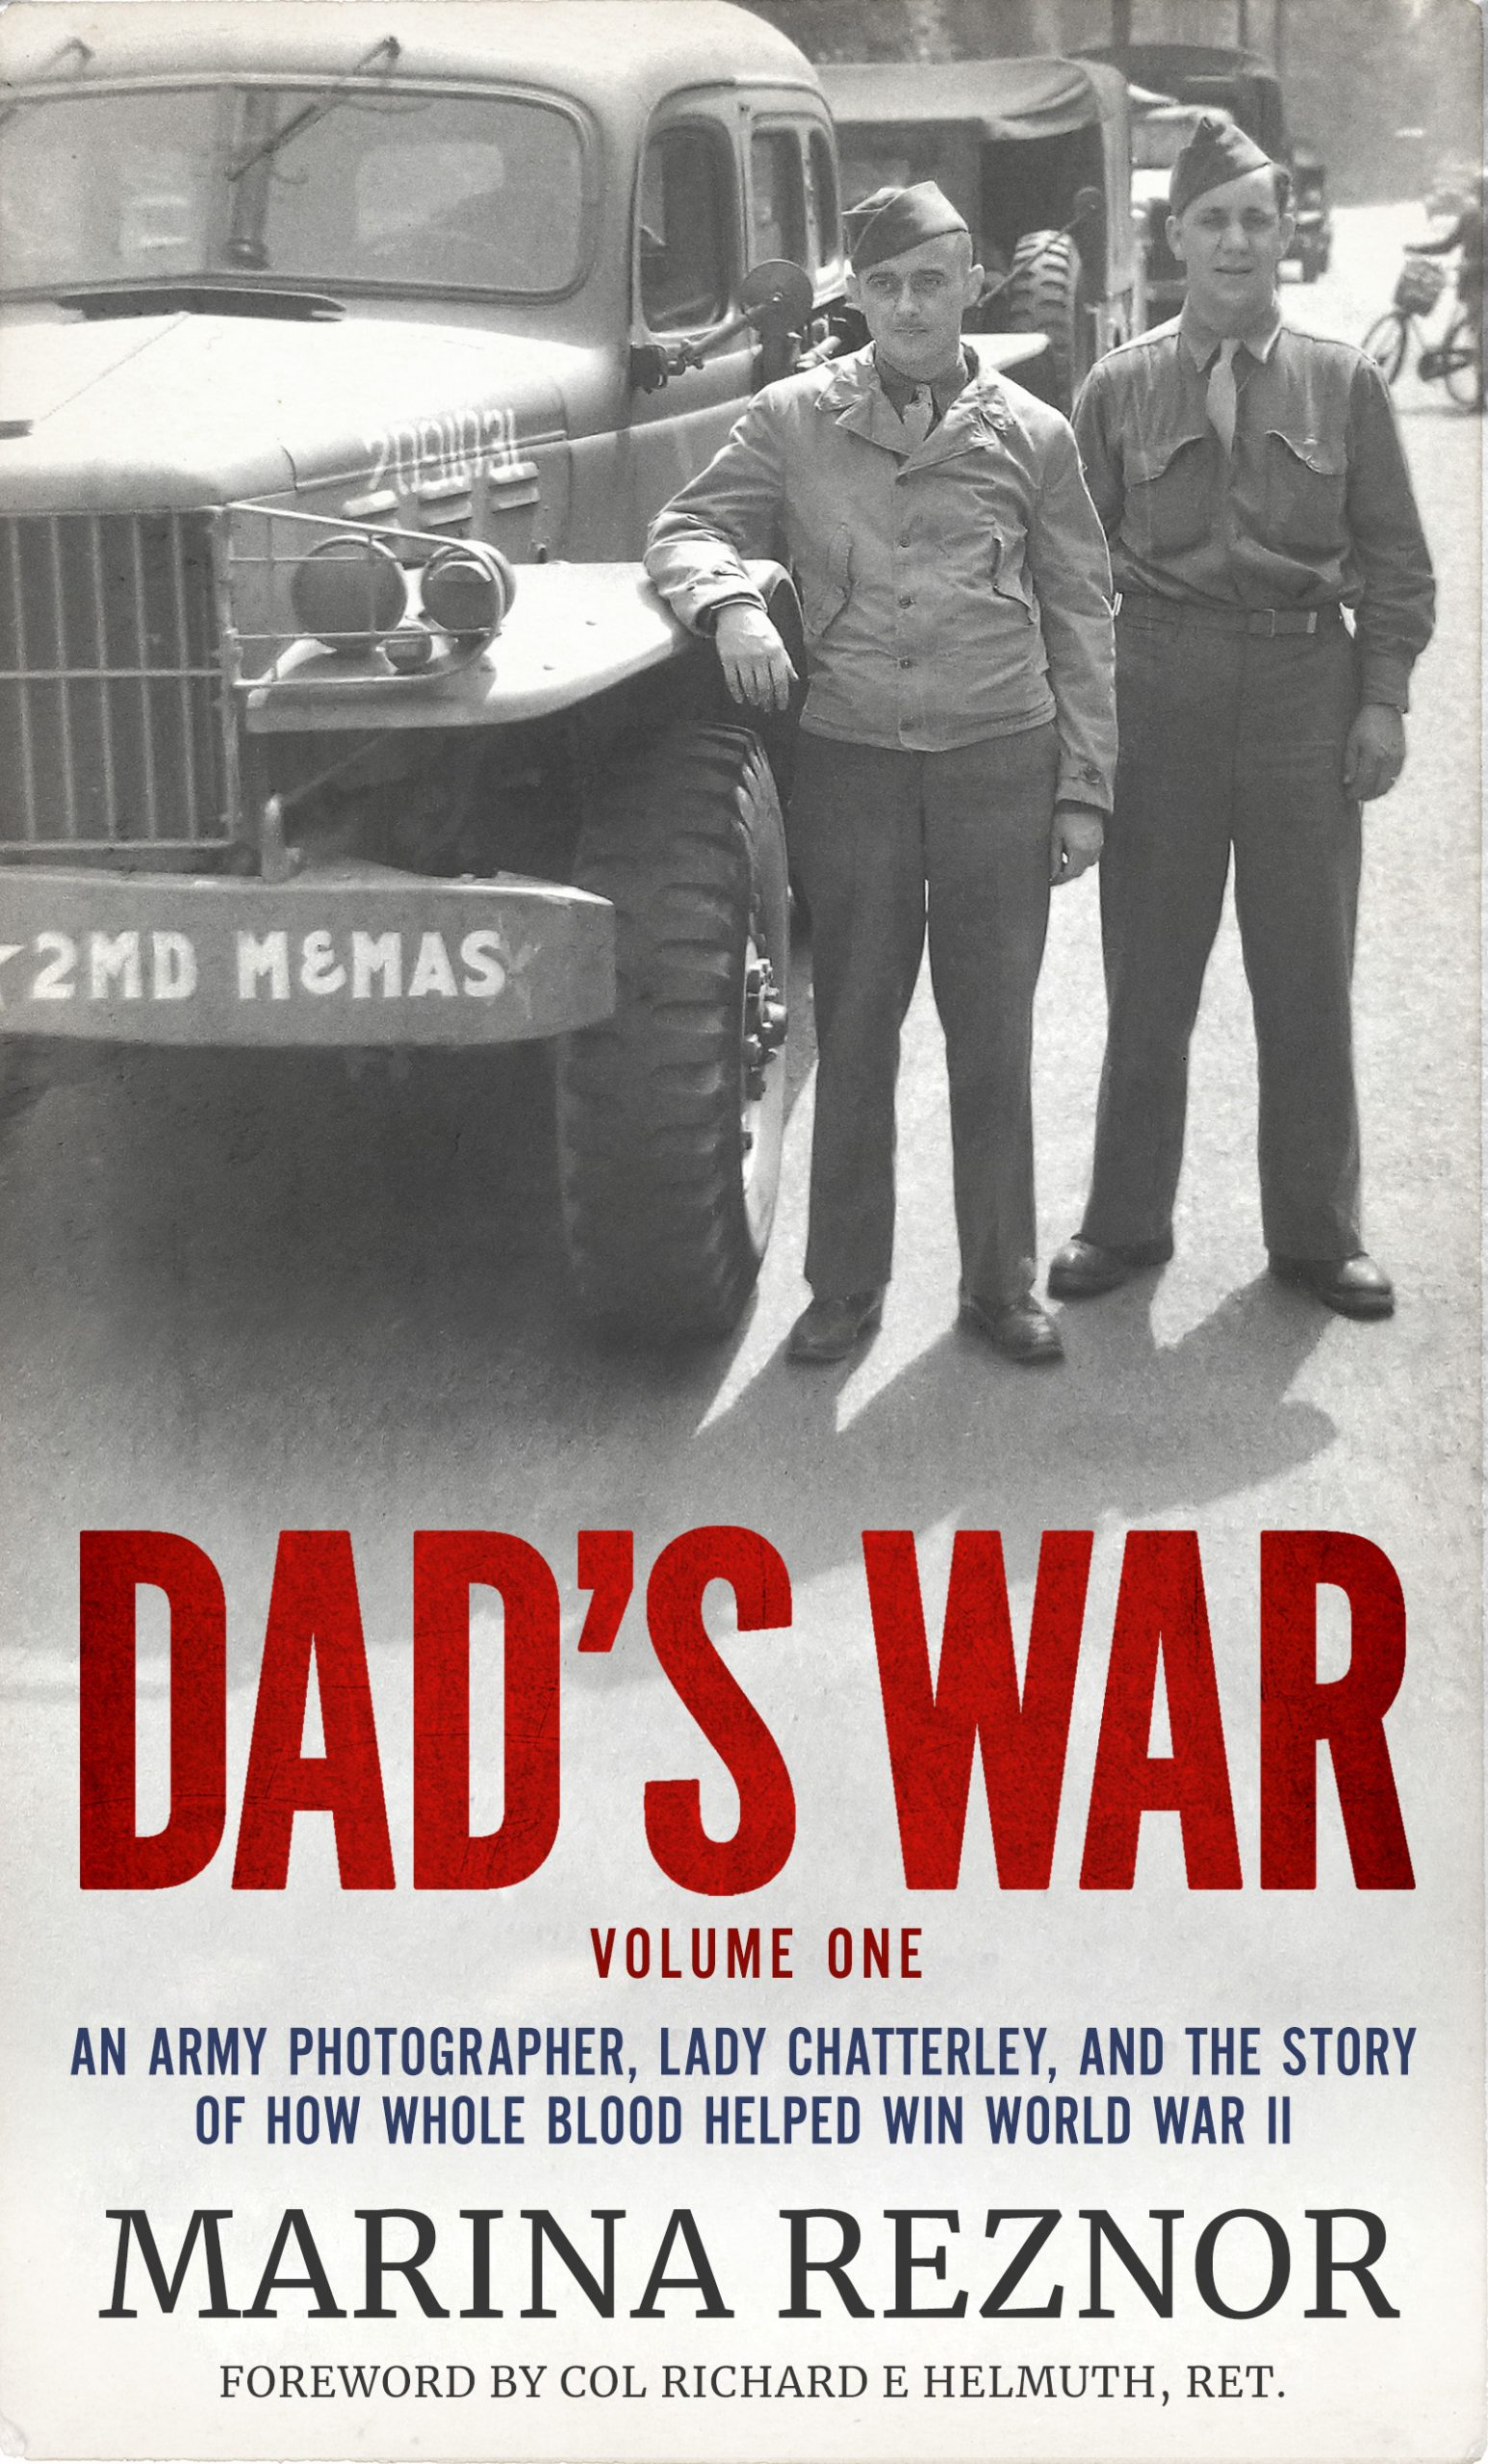 Dad's War Marina Reznor cover